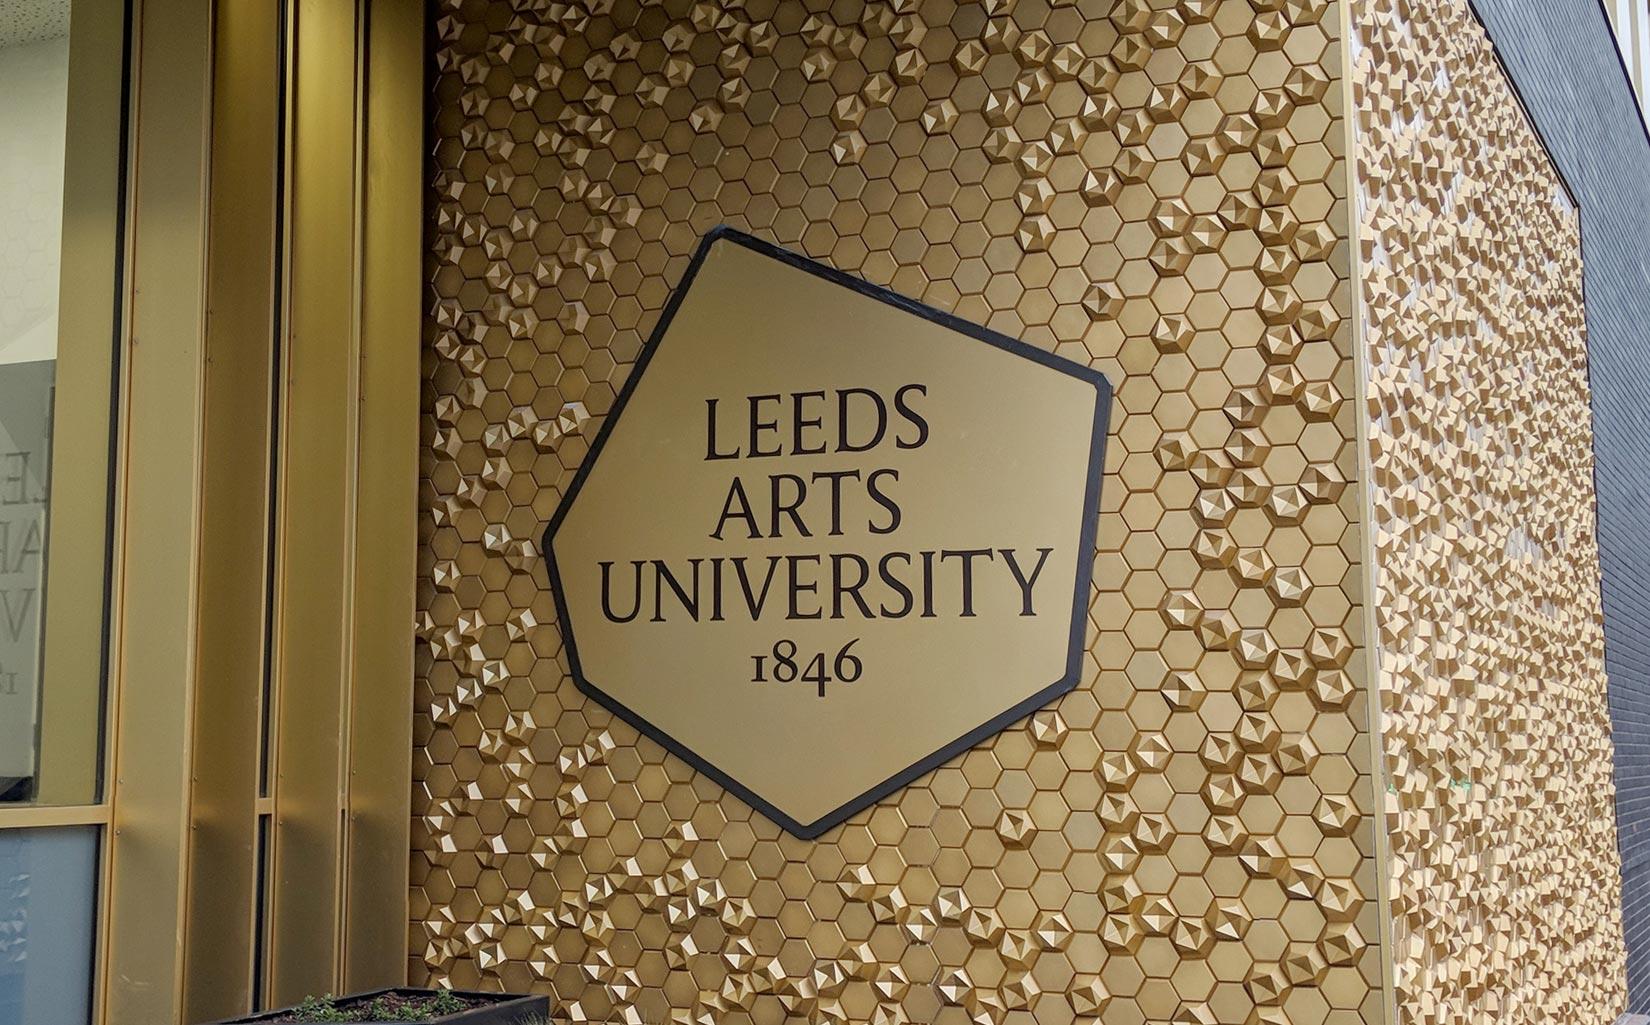 Leeds Arts University, Signage & Façade Detail